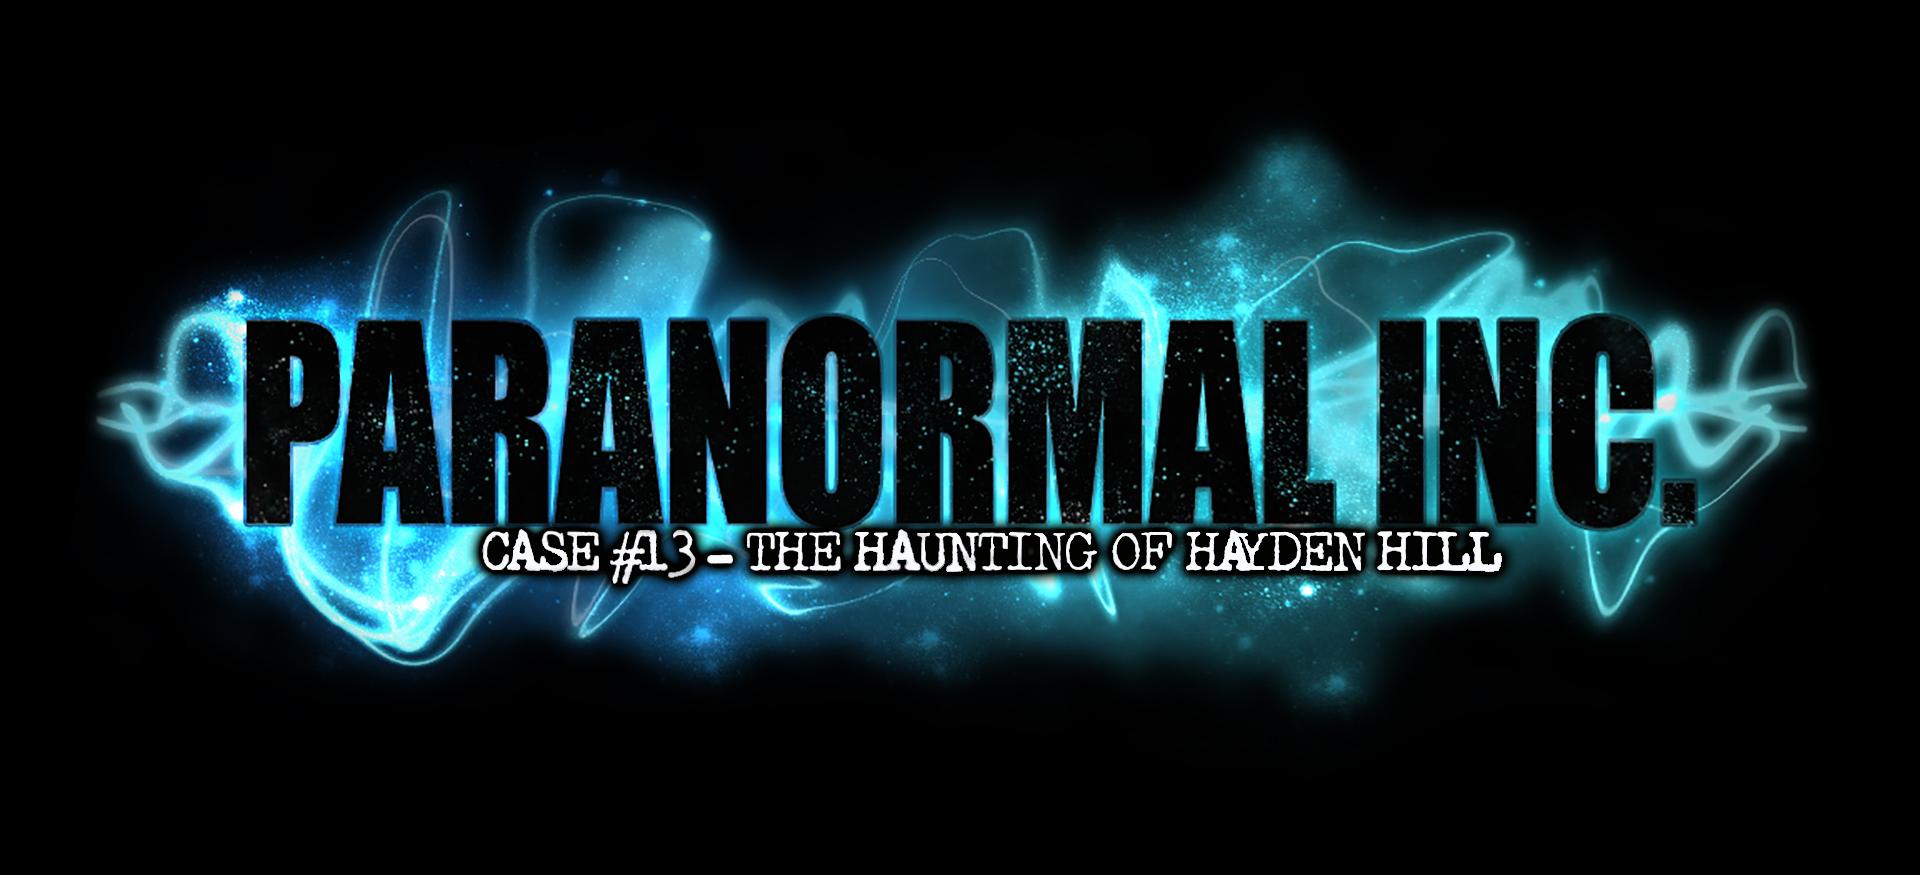 Paranormal, Inc. (Image courtesy of Knott's Scary Farm)